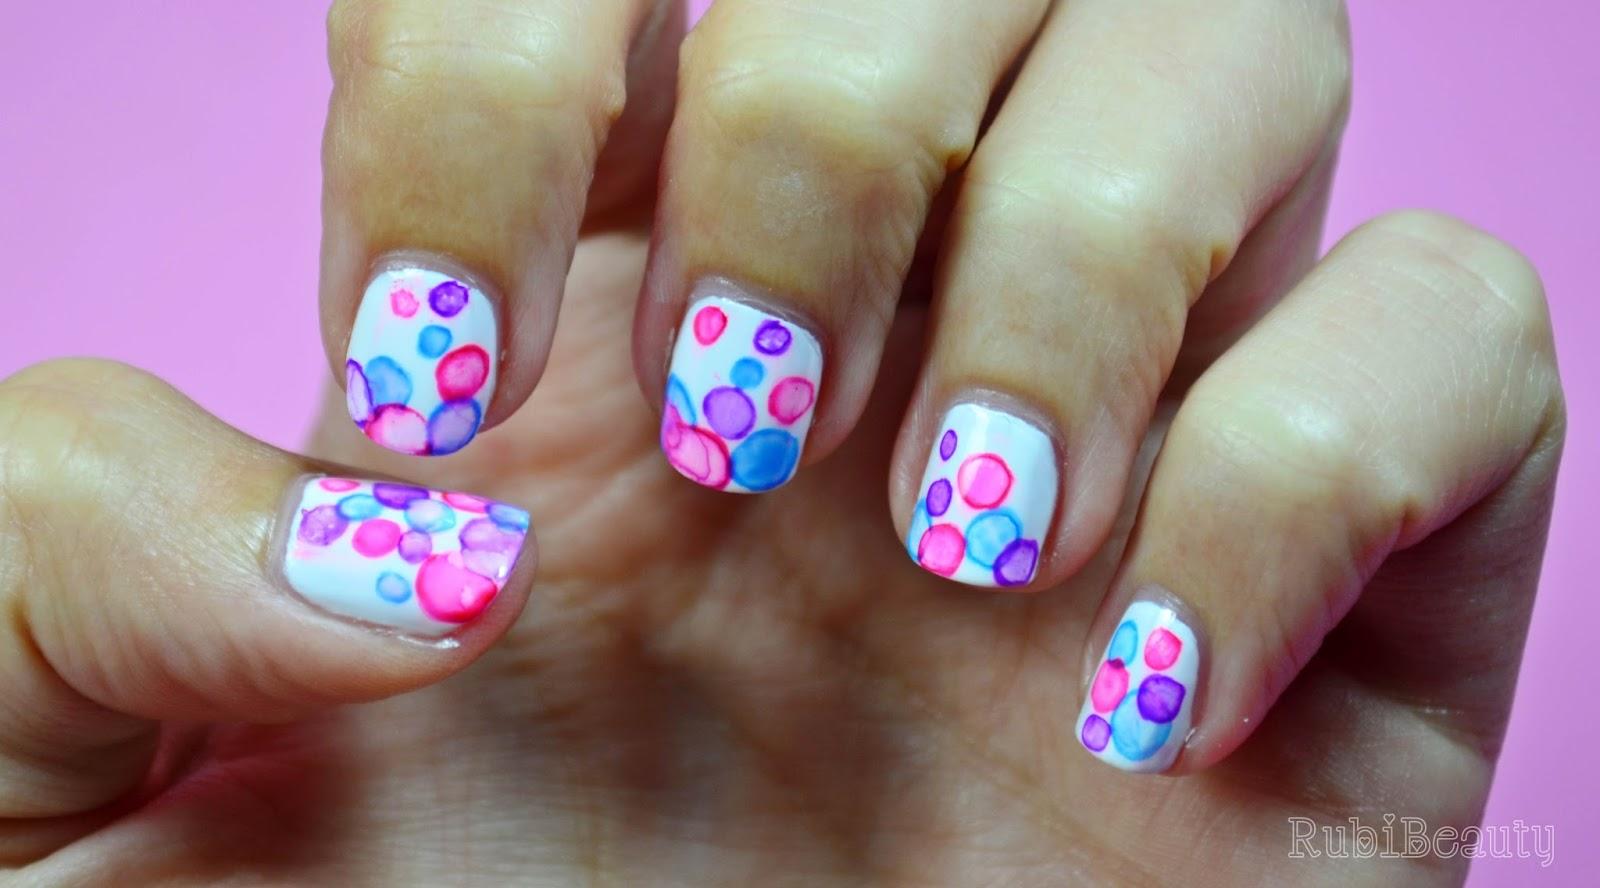 rubibeauty uñas manicura burbujas bubbles